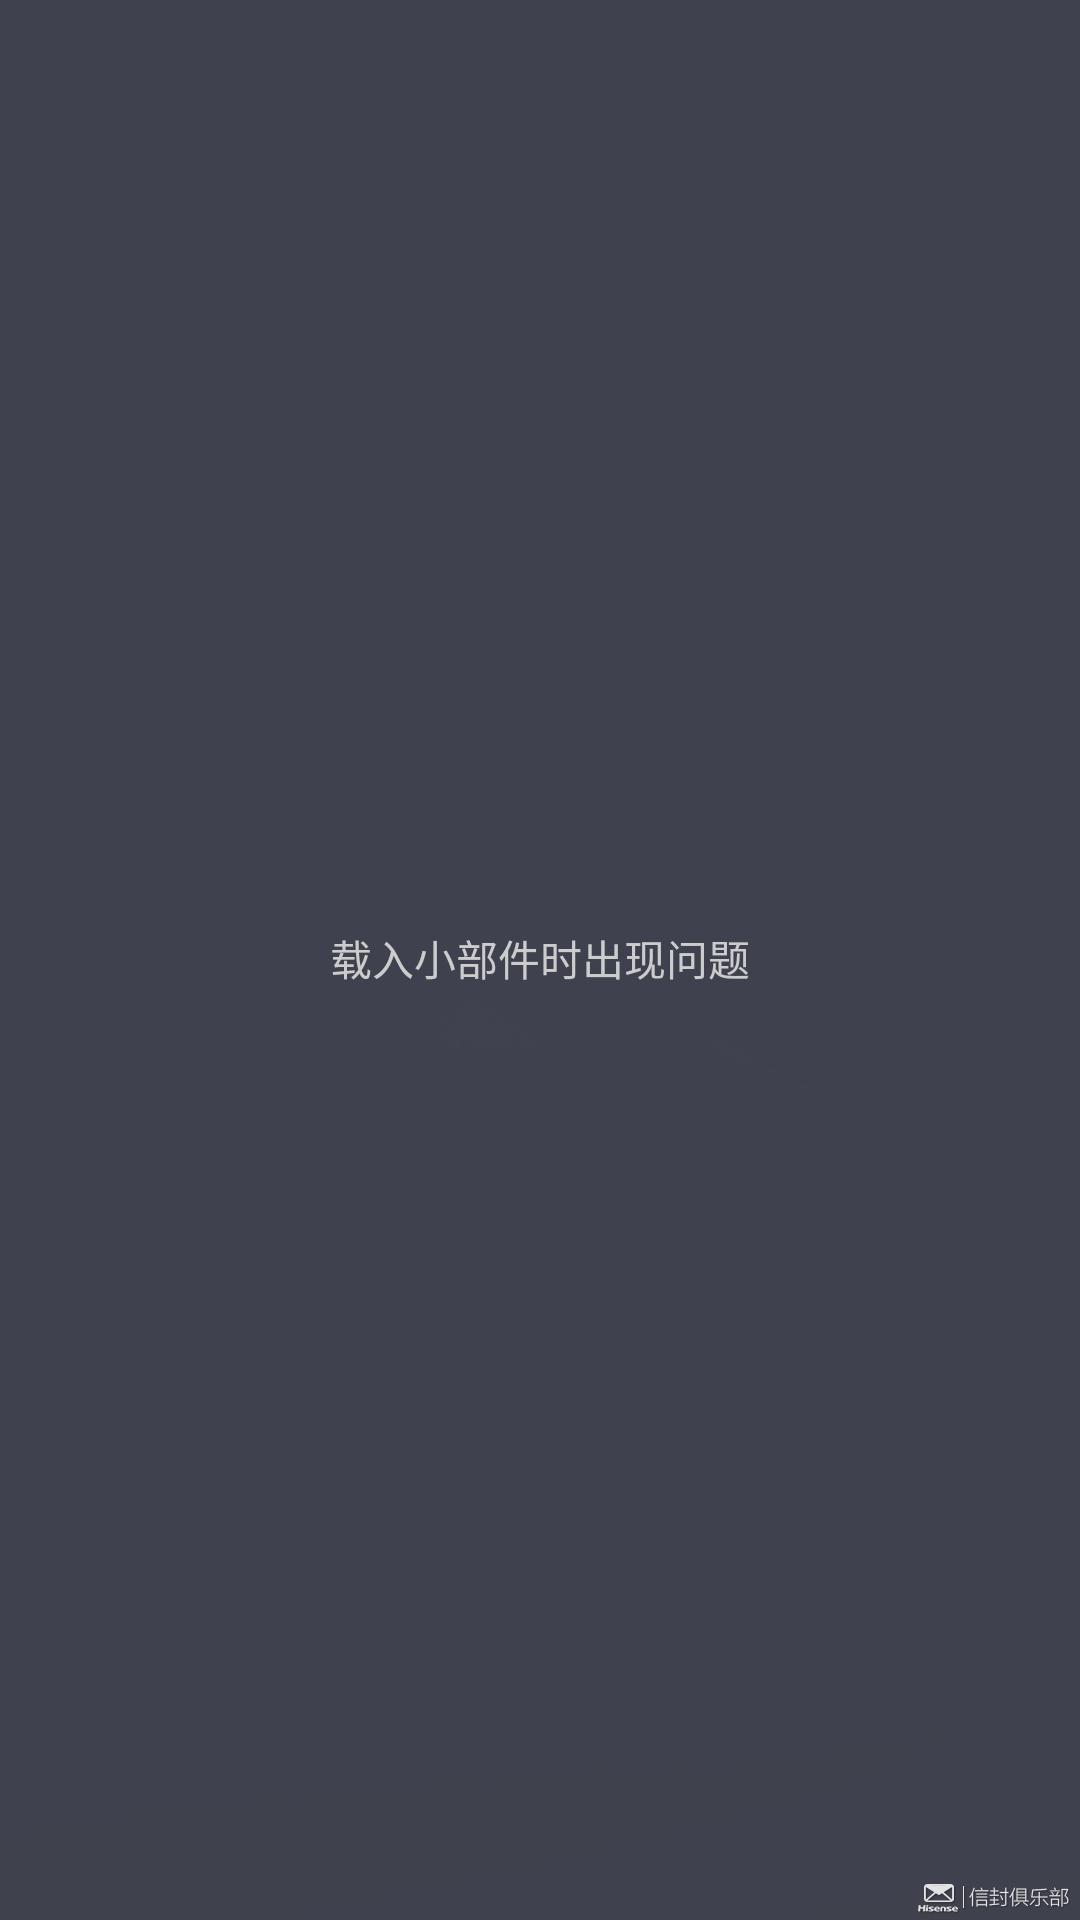 Screenshot_20180110-143617_Vision桌面.png